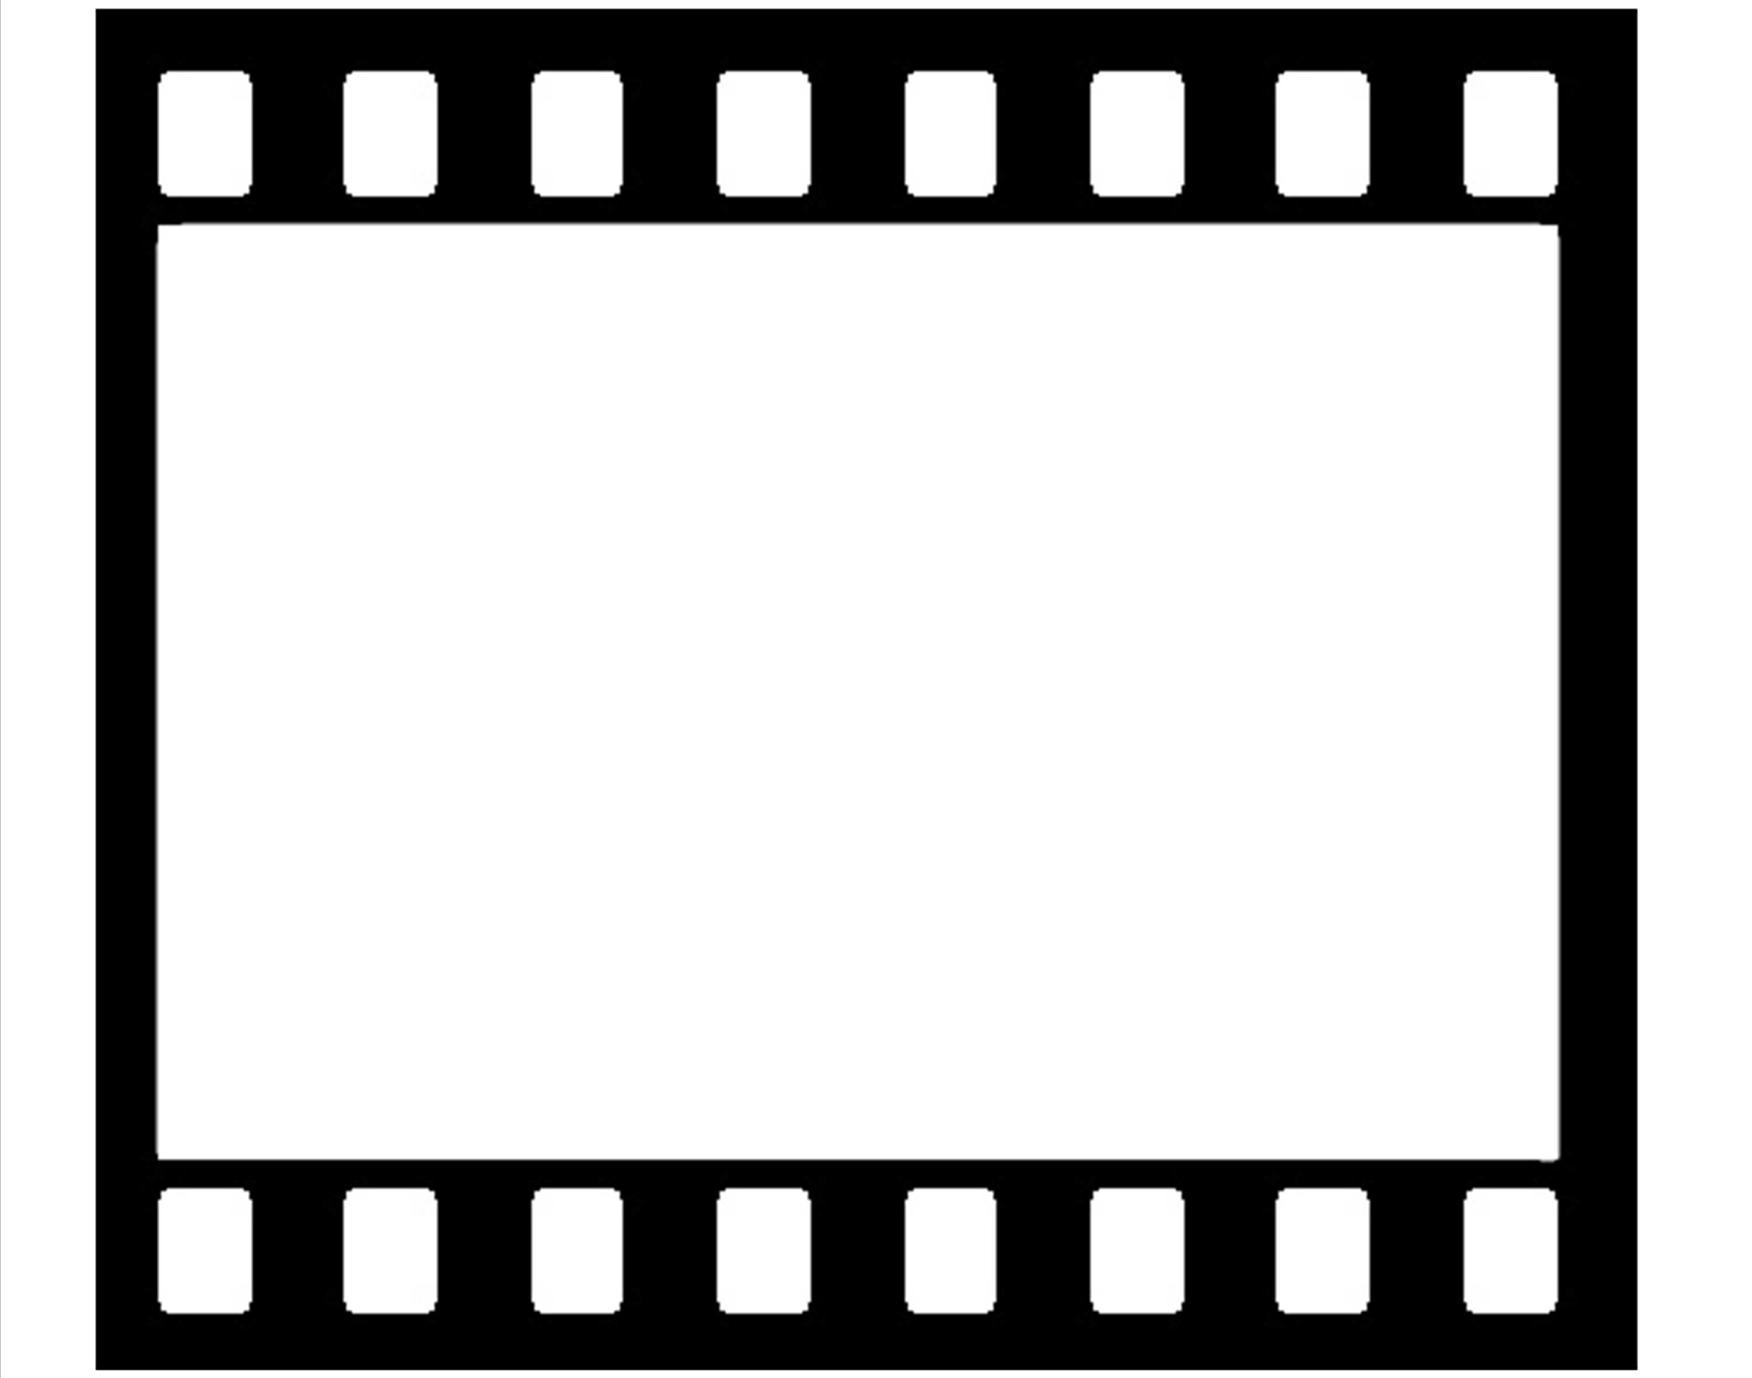 Movie film border clipart svg transparent download Movie Clipart Border | Free download best Movie Clipart ... svg transparent download